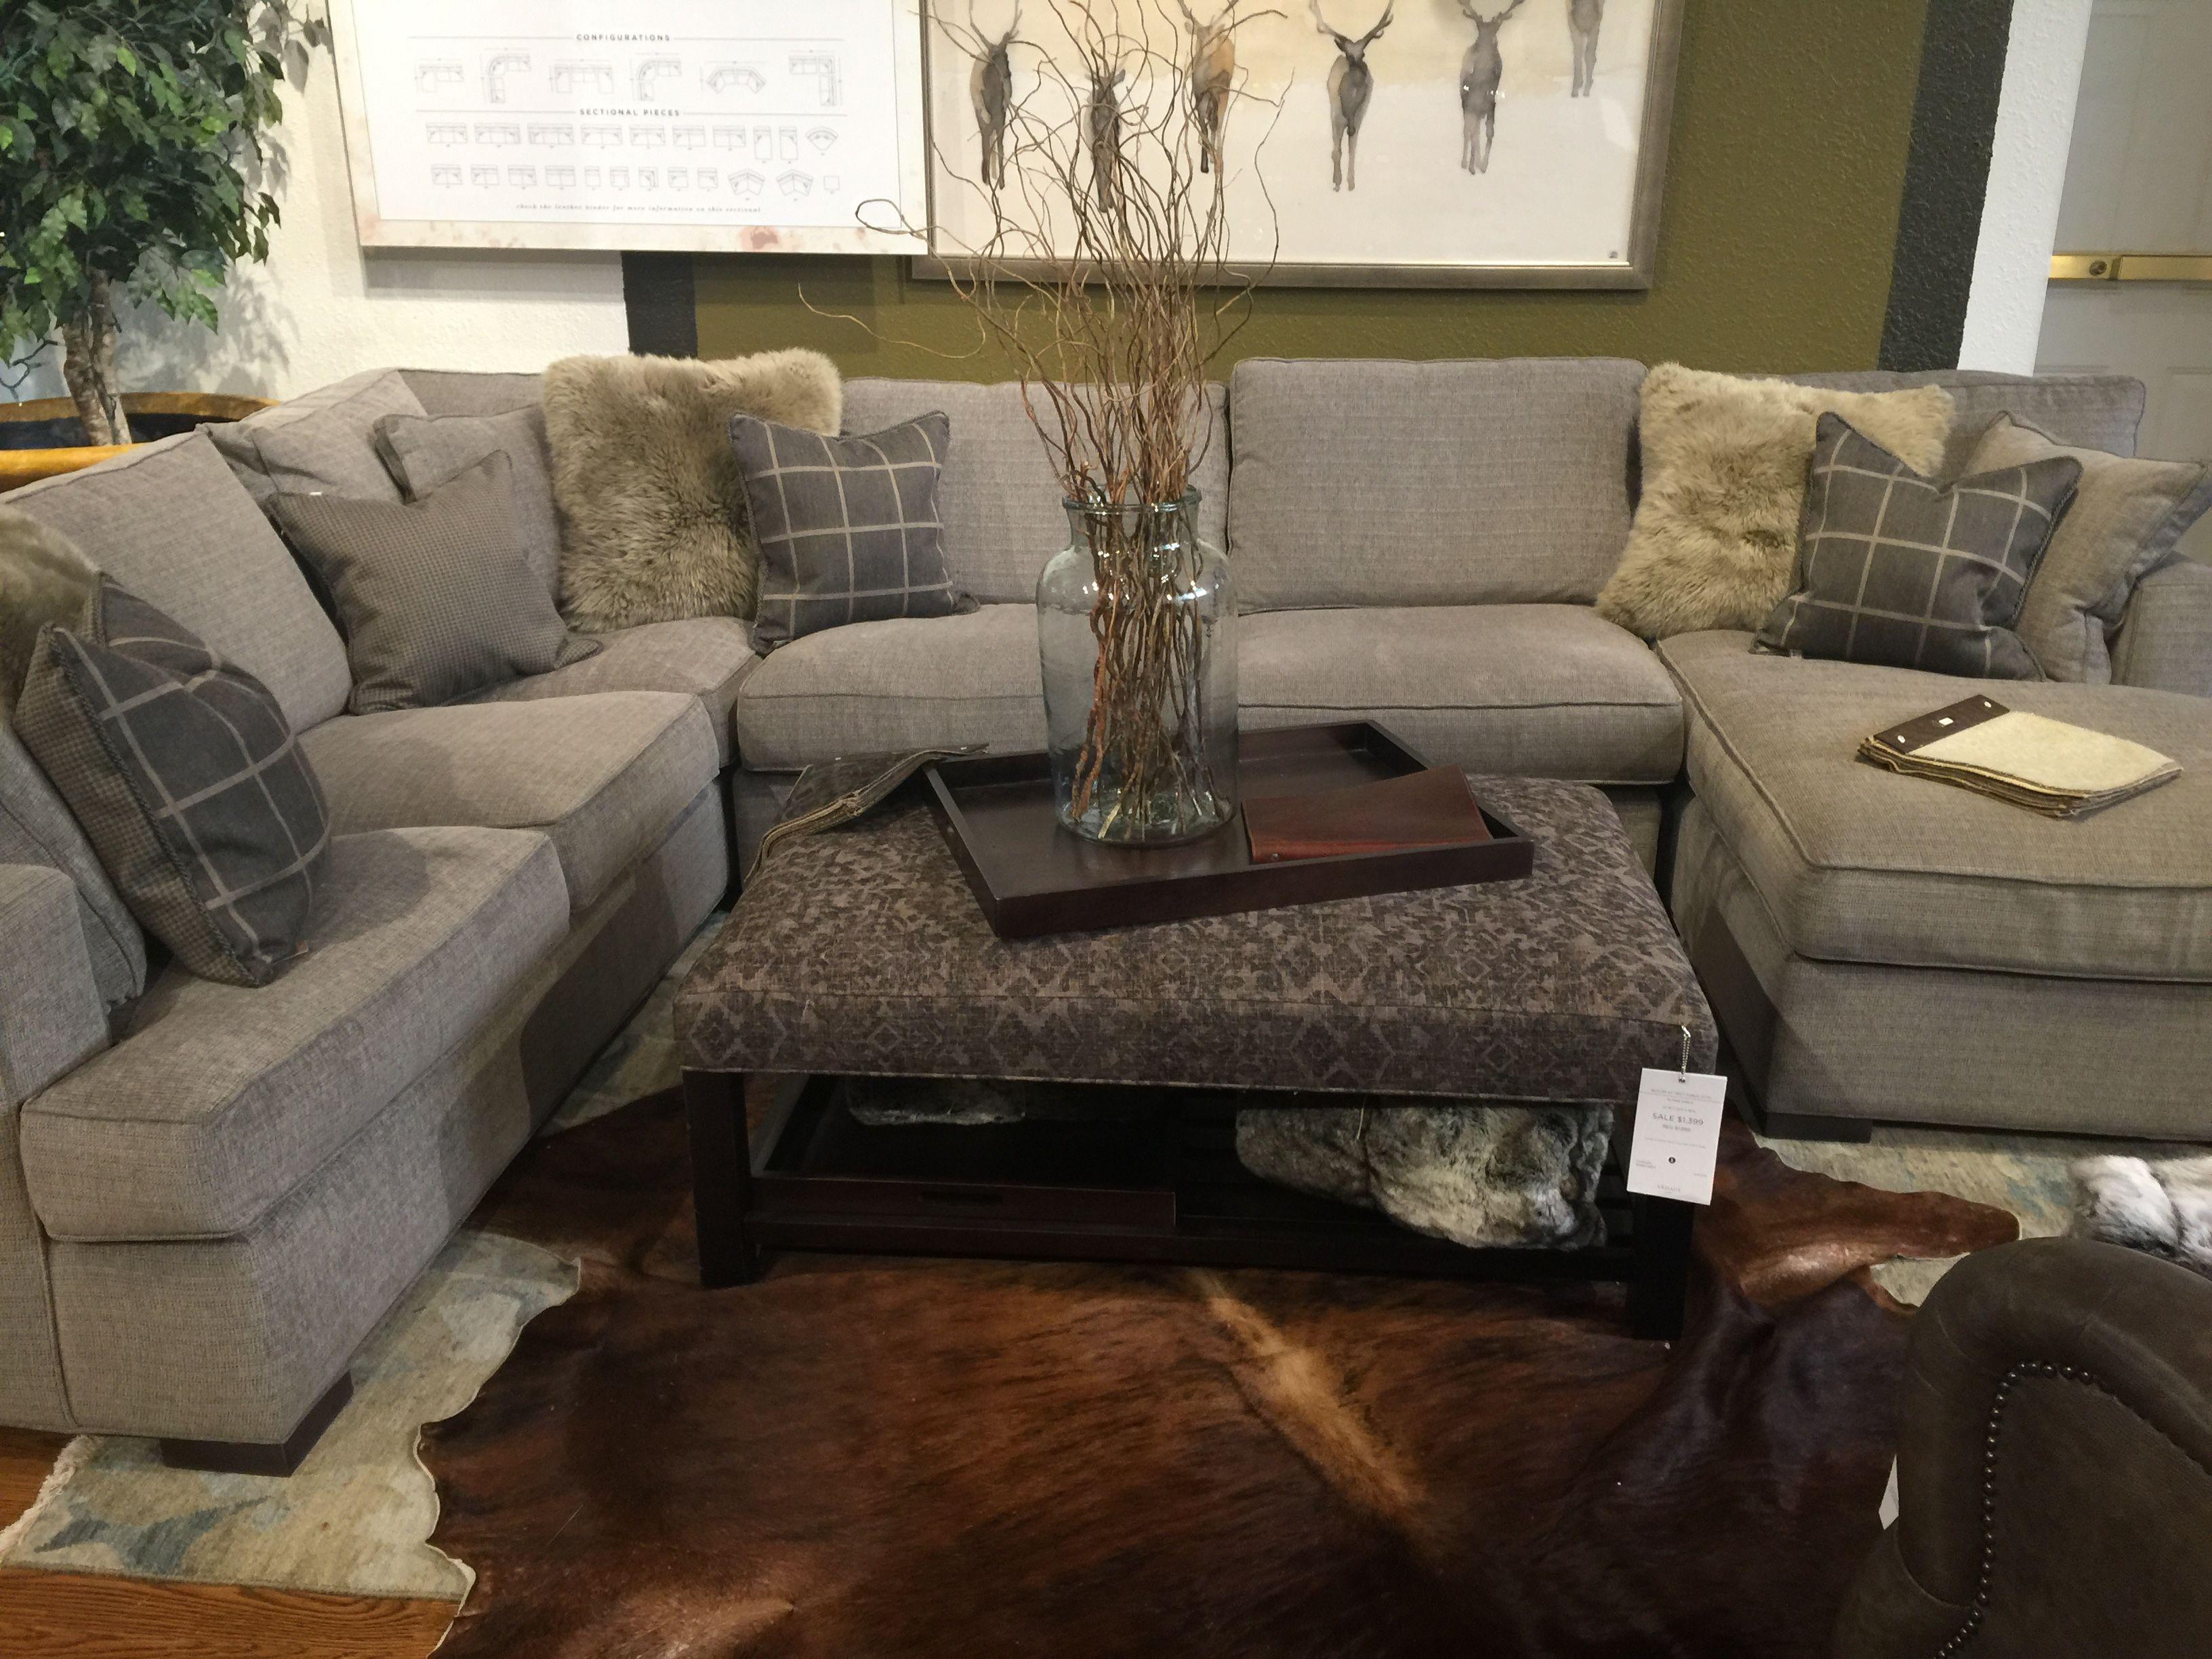 dune sofa tan faux leather sleeper arhaus 88 upholstered furniture